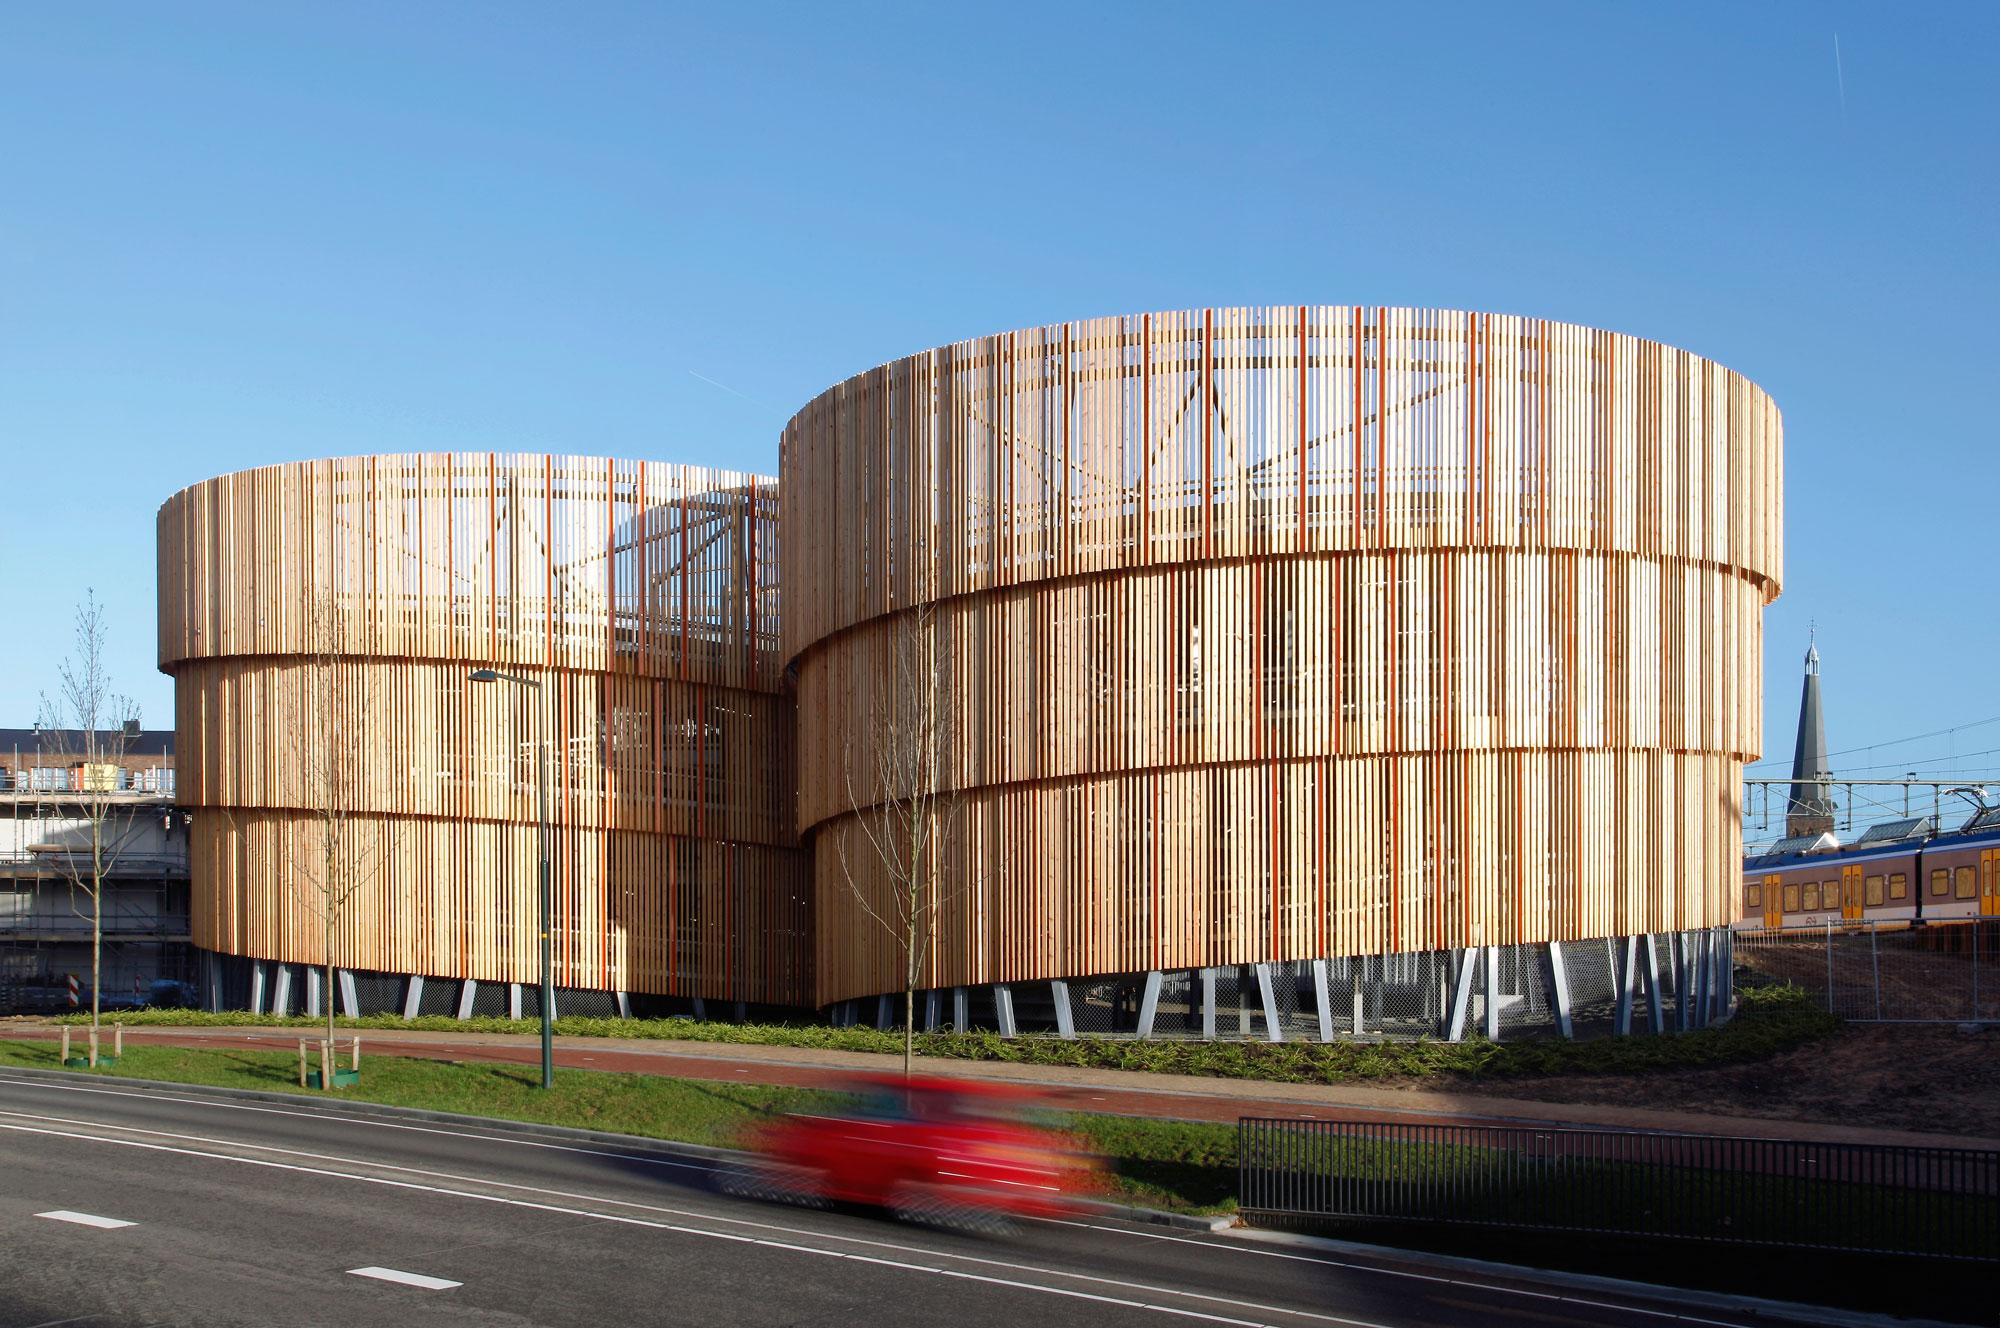 Silo Meubels Zutphen : P r parkeergarage zutphen u moederscheimmoonen de architect